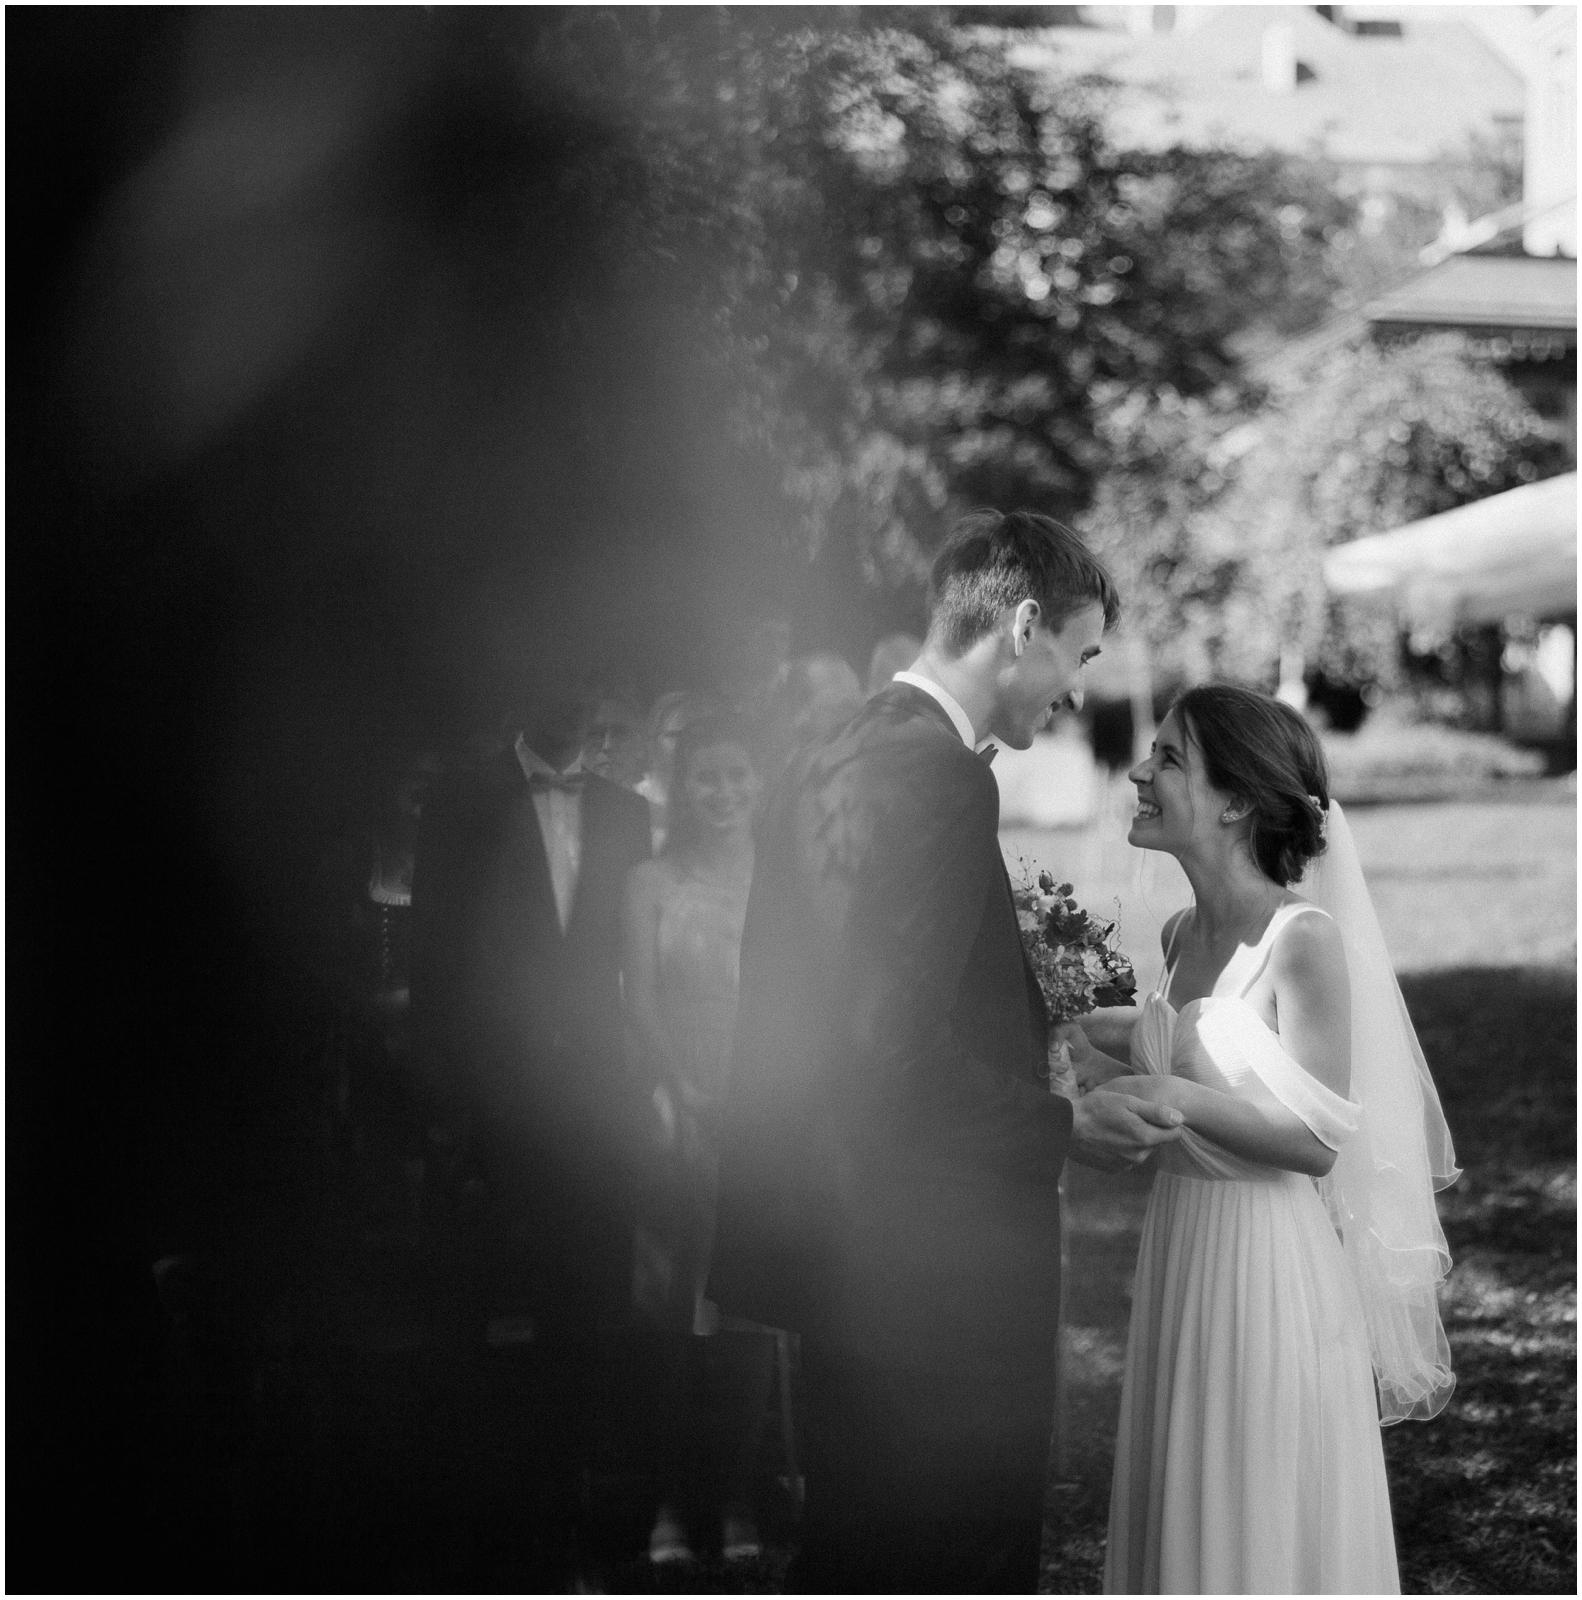 mirjam_thomas_wedding-328-2.jpg